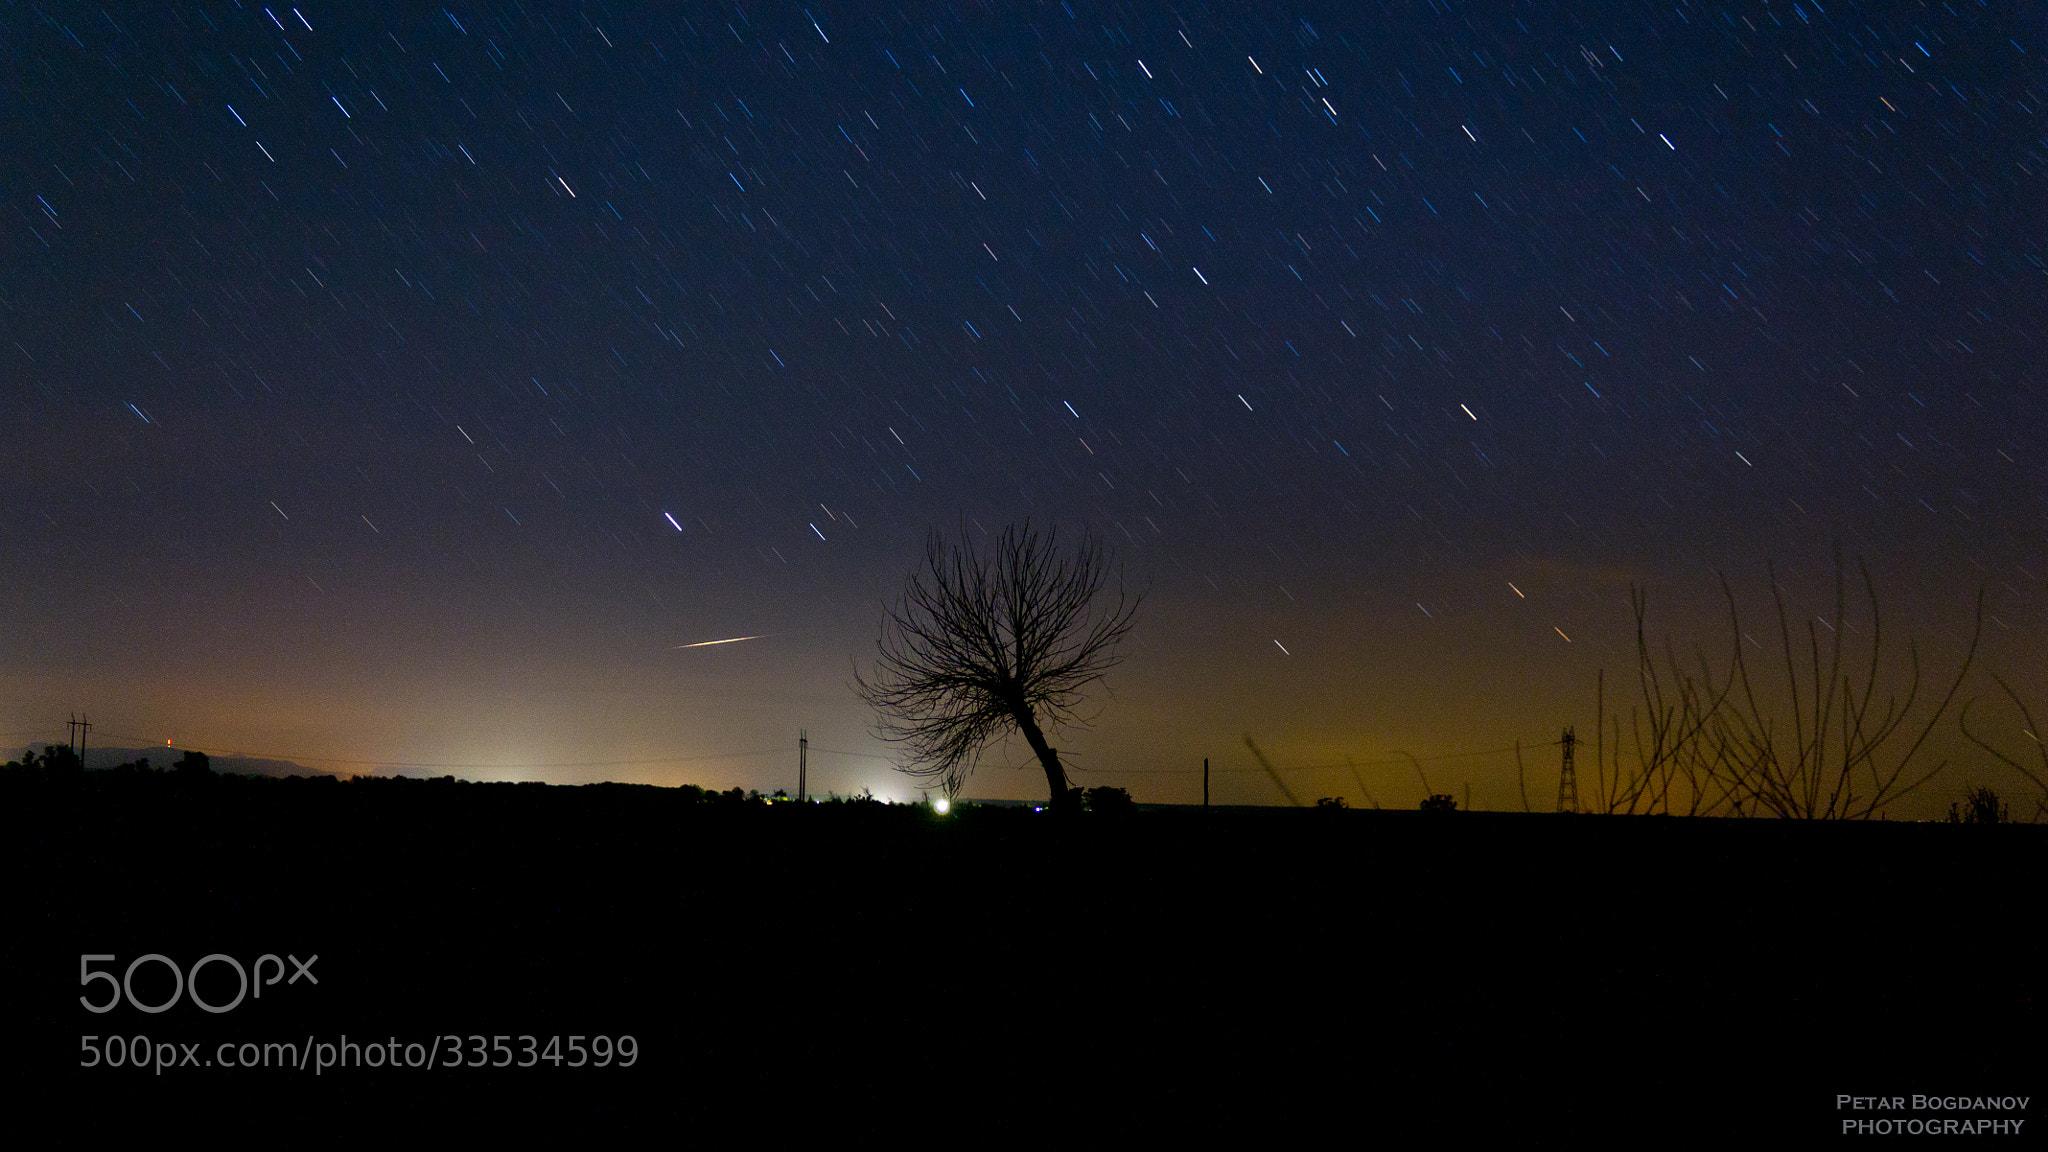 Photograph Silent Night by Petar Bogdanov on 500px